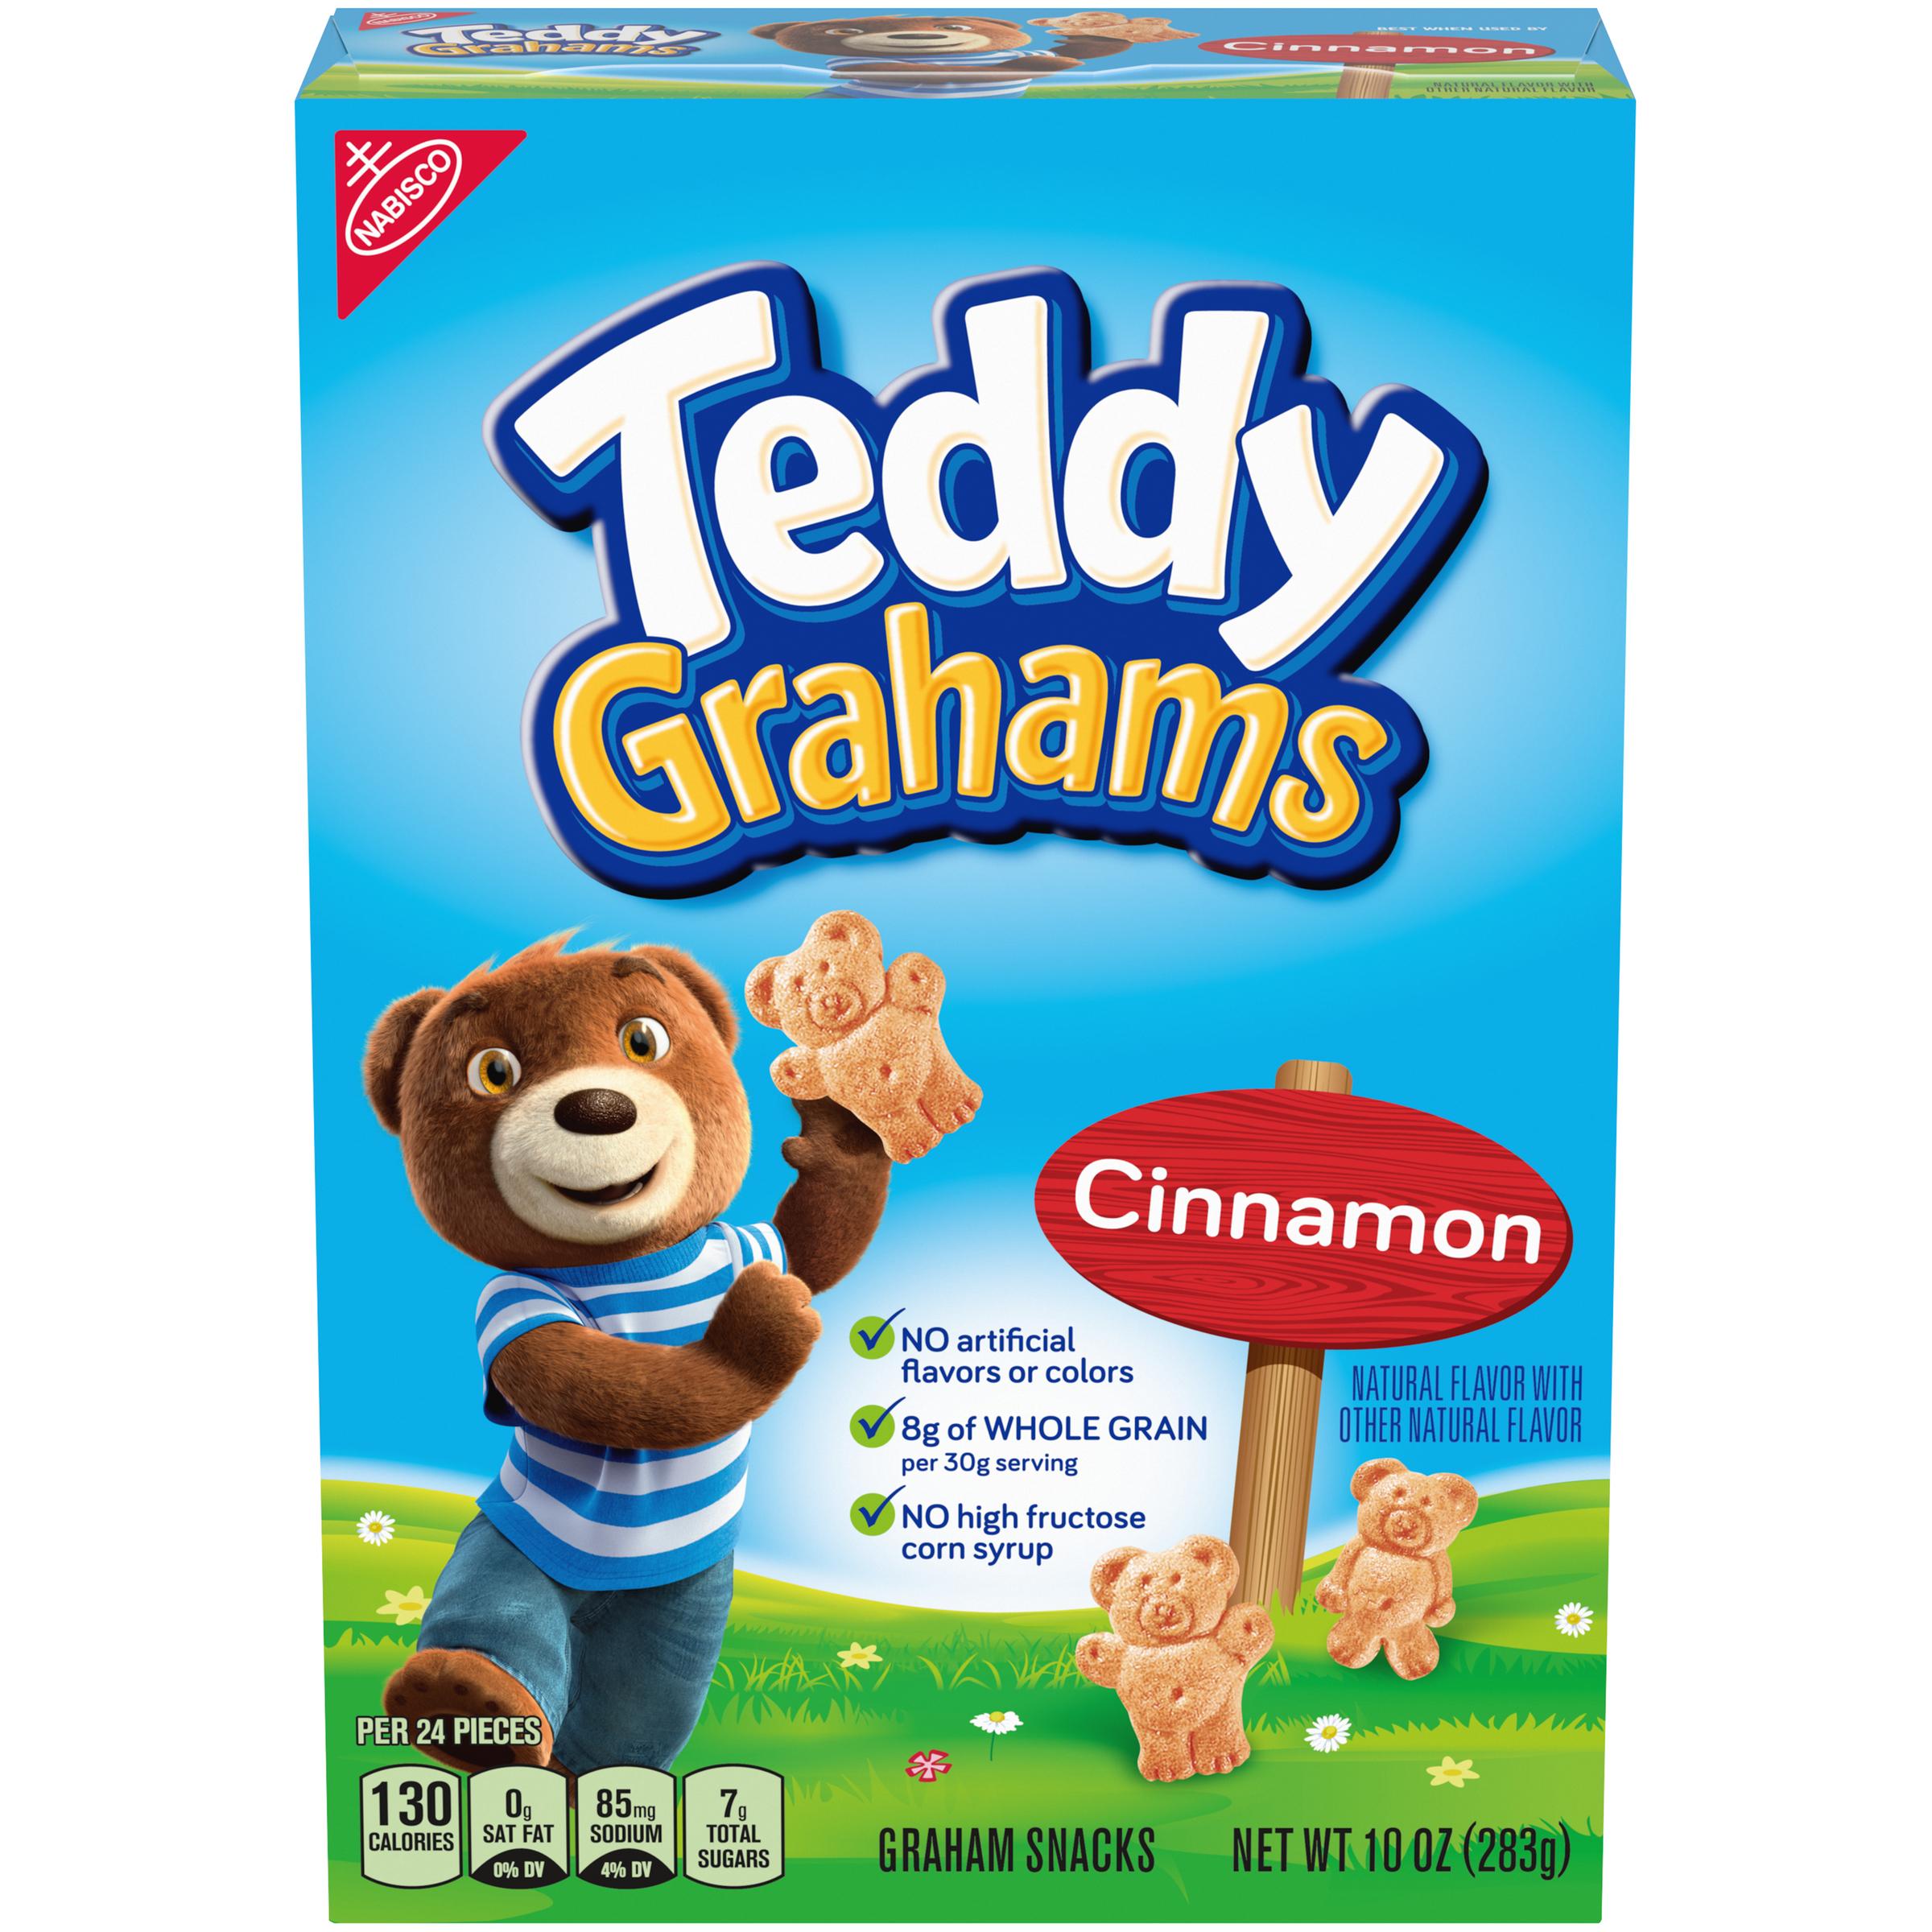 TEDDY GRAHAMS Cinnamon Cookies 10 oz